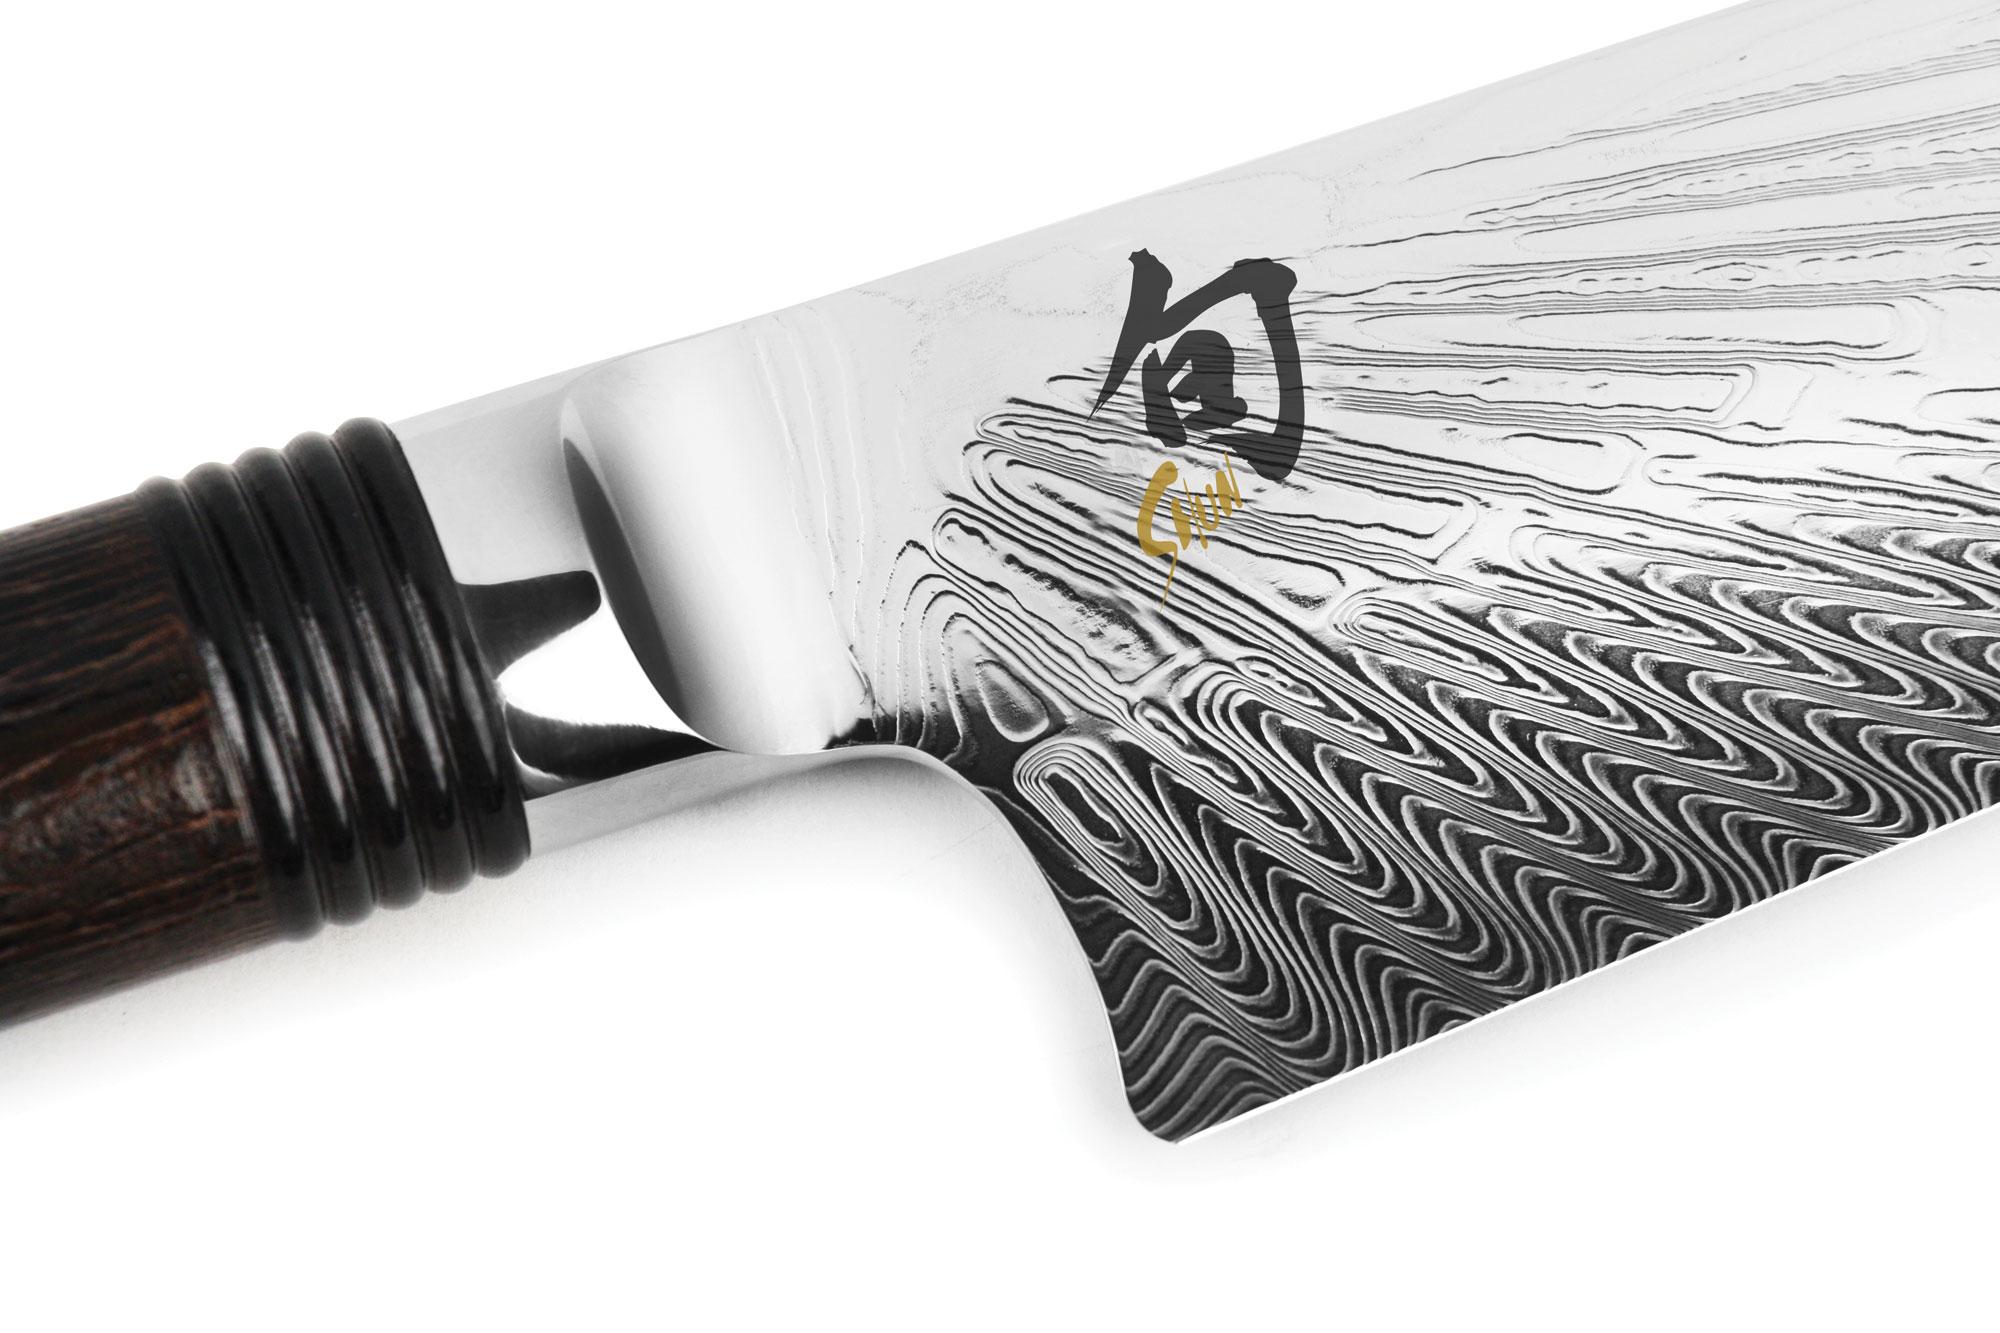 Shun Hana Limited Edition Chefs Knife  BladeForumscom